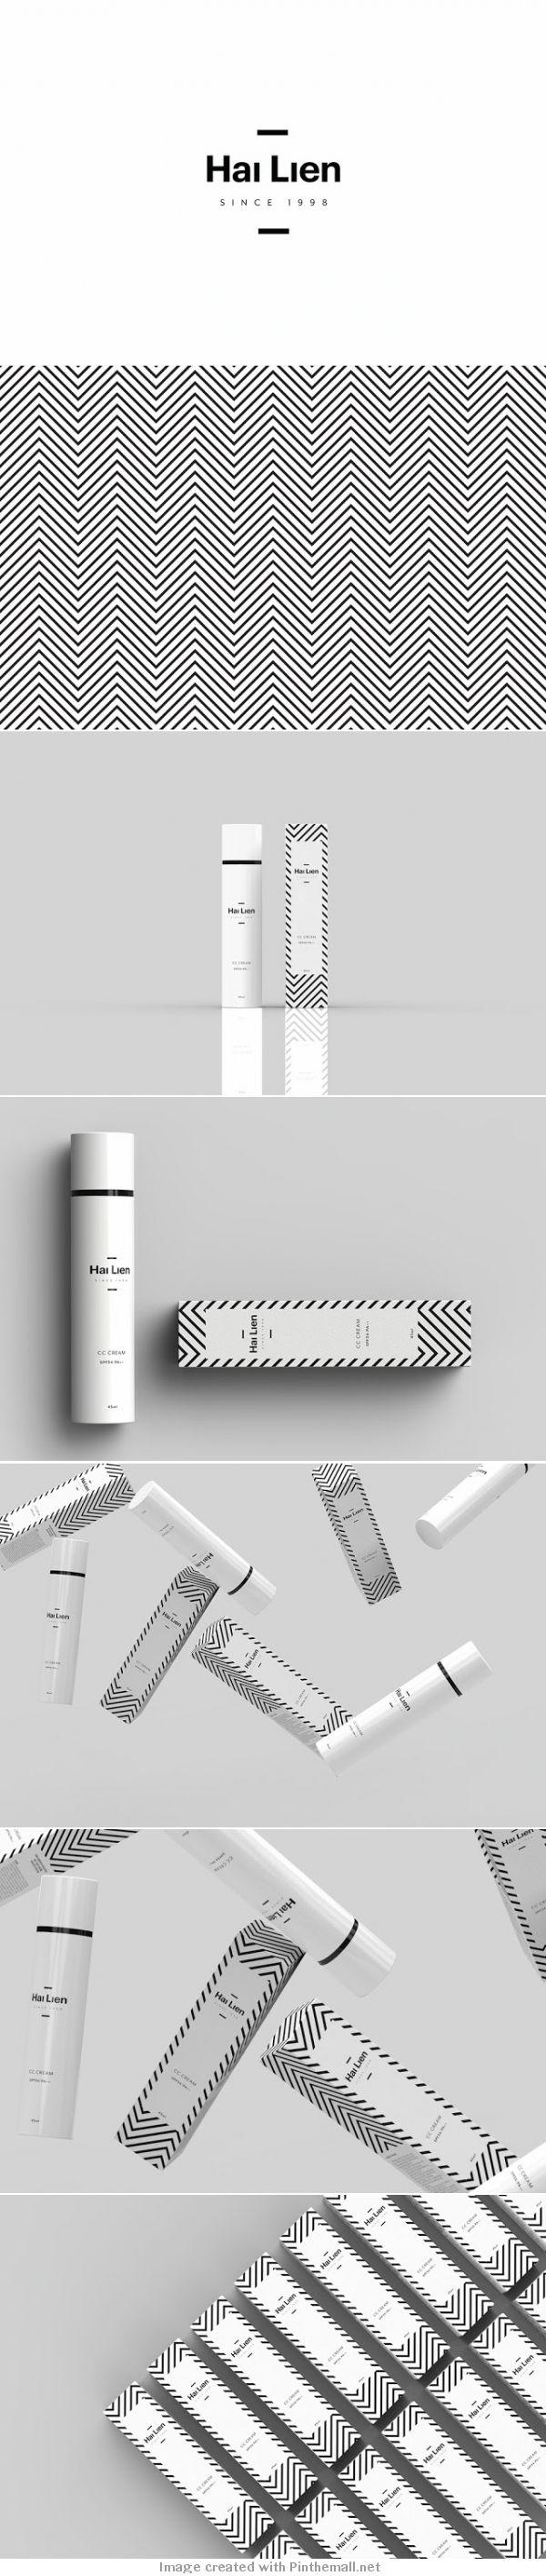 Cool Brand Identity Design. Hai Lien. #branding #brandidentity [http://www.pinterest.com/alfredchong/]